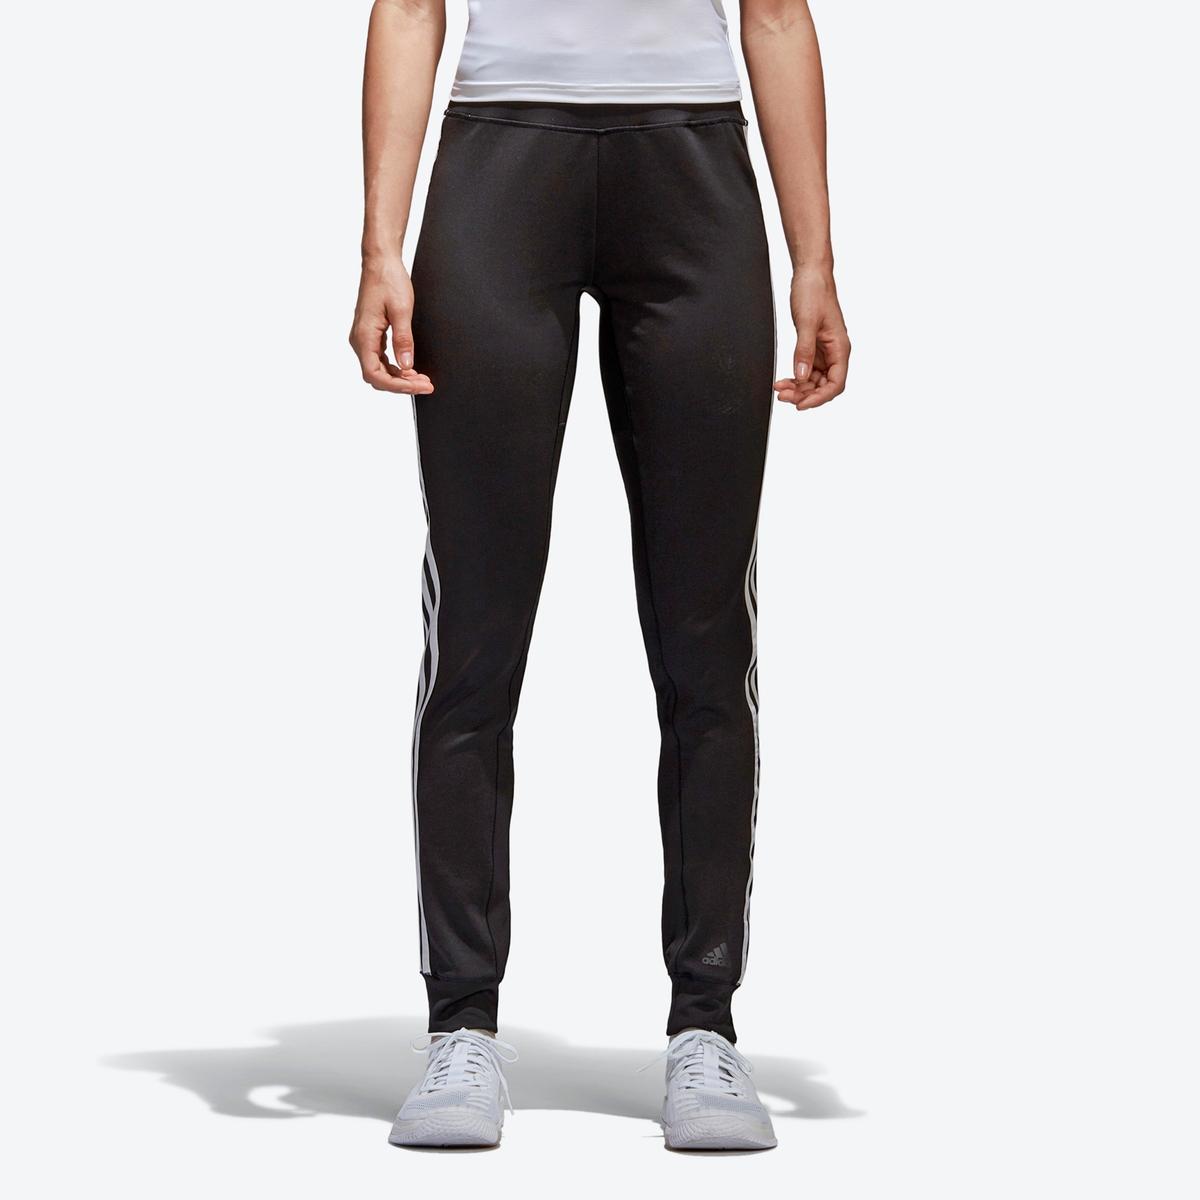 Pantaloni da jogging 3 bande BK2623